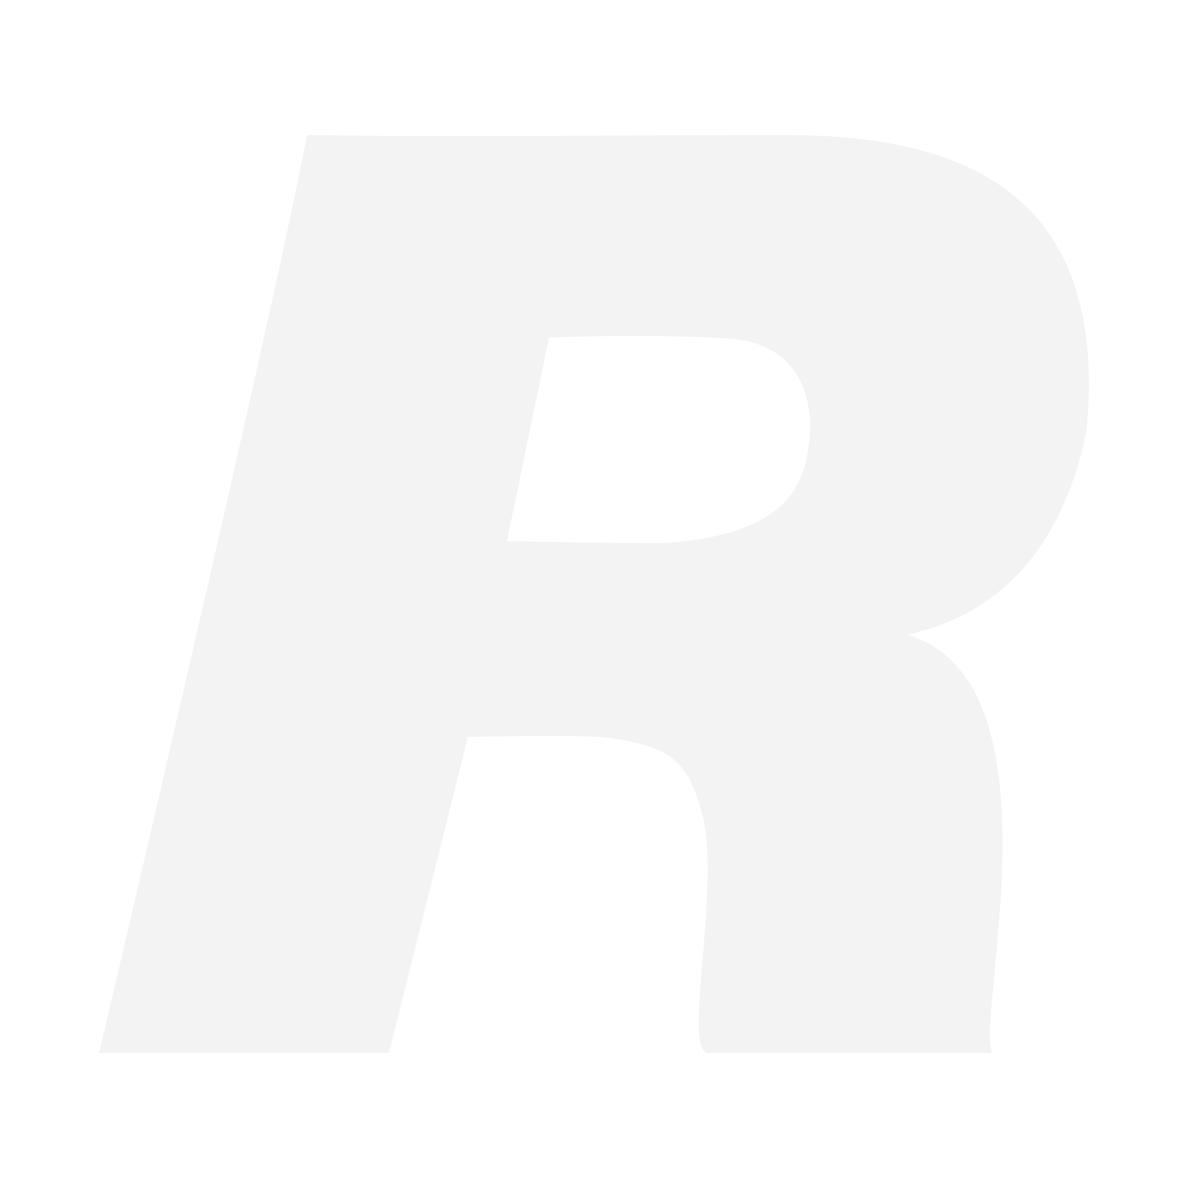 SanDisk USB 3.1 ImageMate Reader -muistikortinlukija